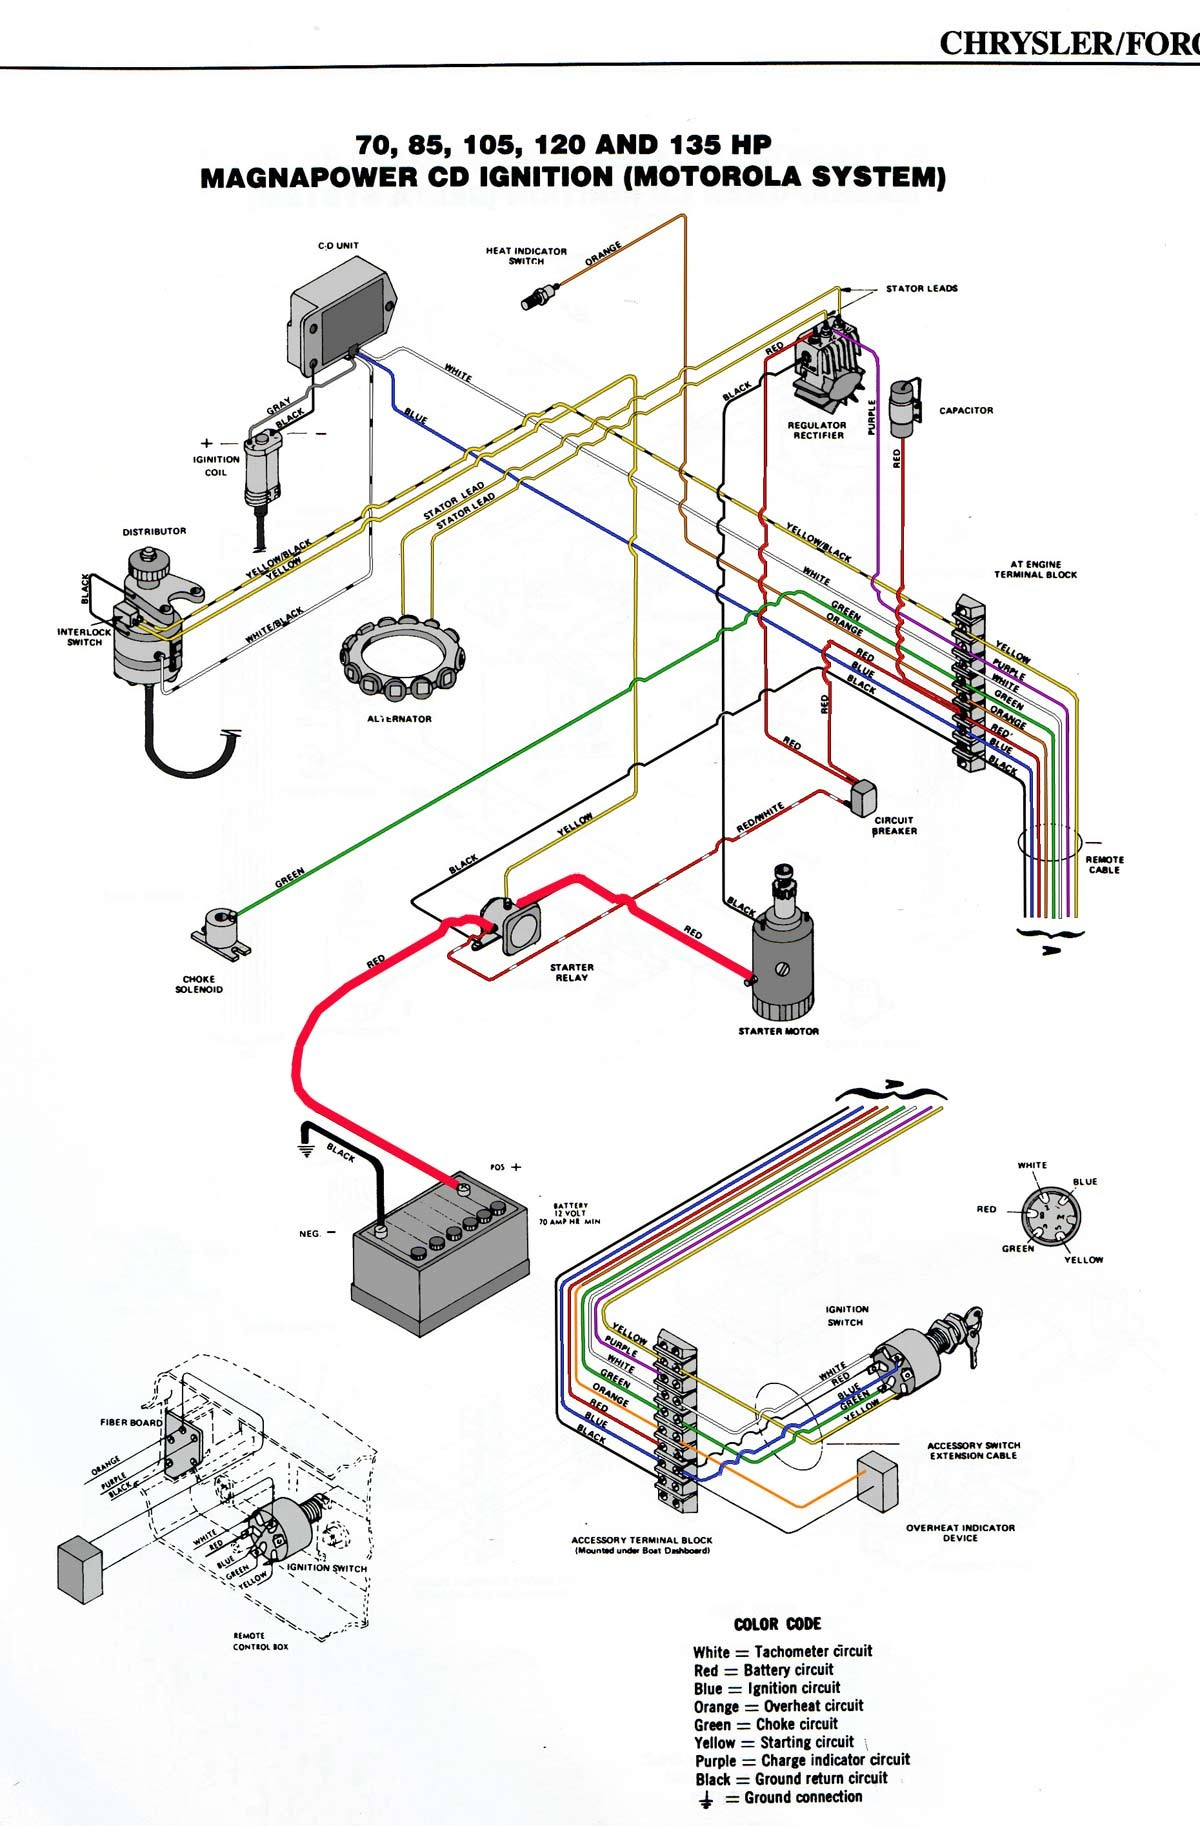 wiring Chrysler 4cyl Motorola